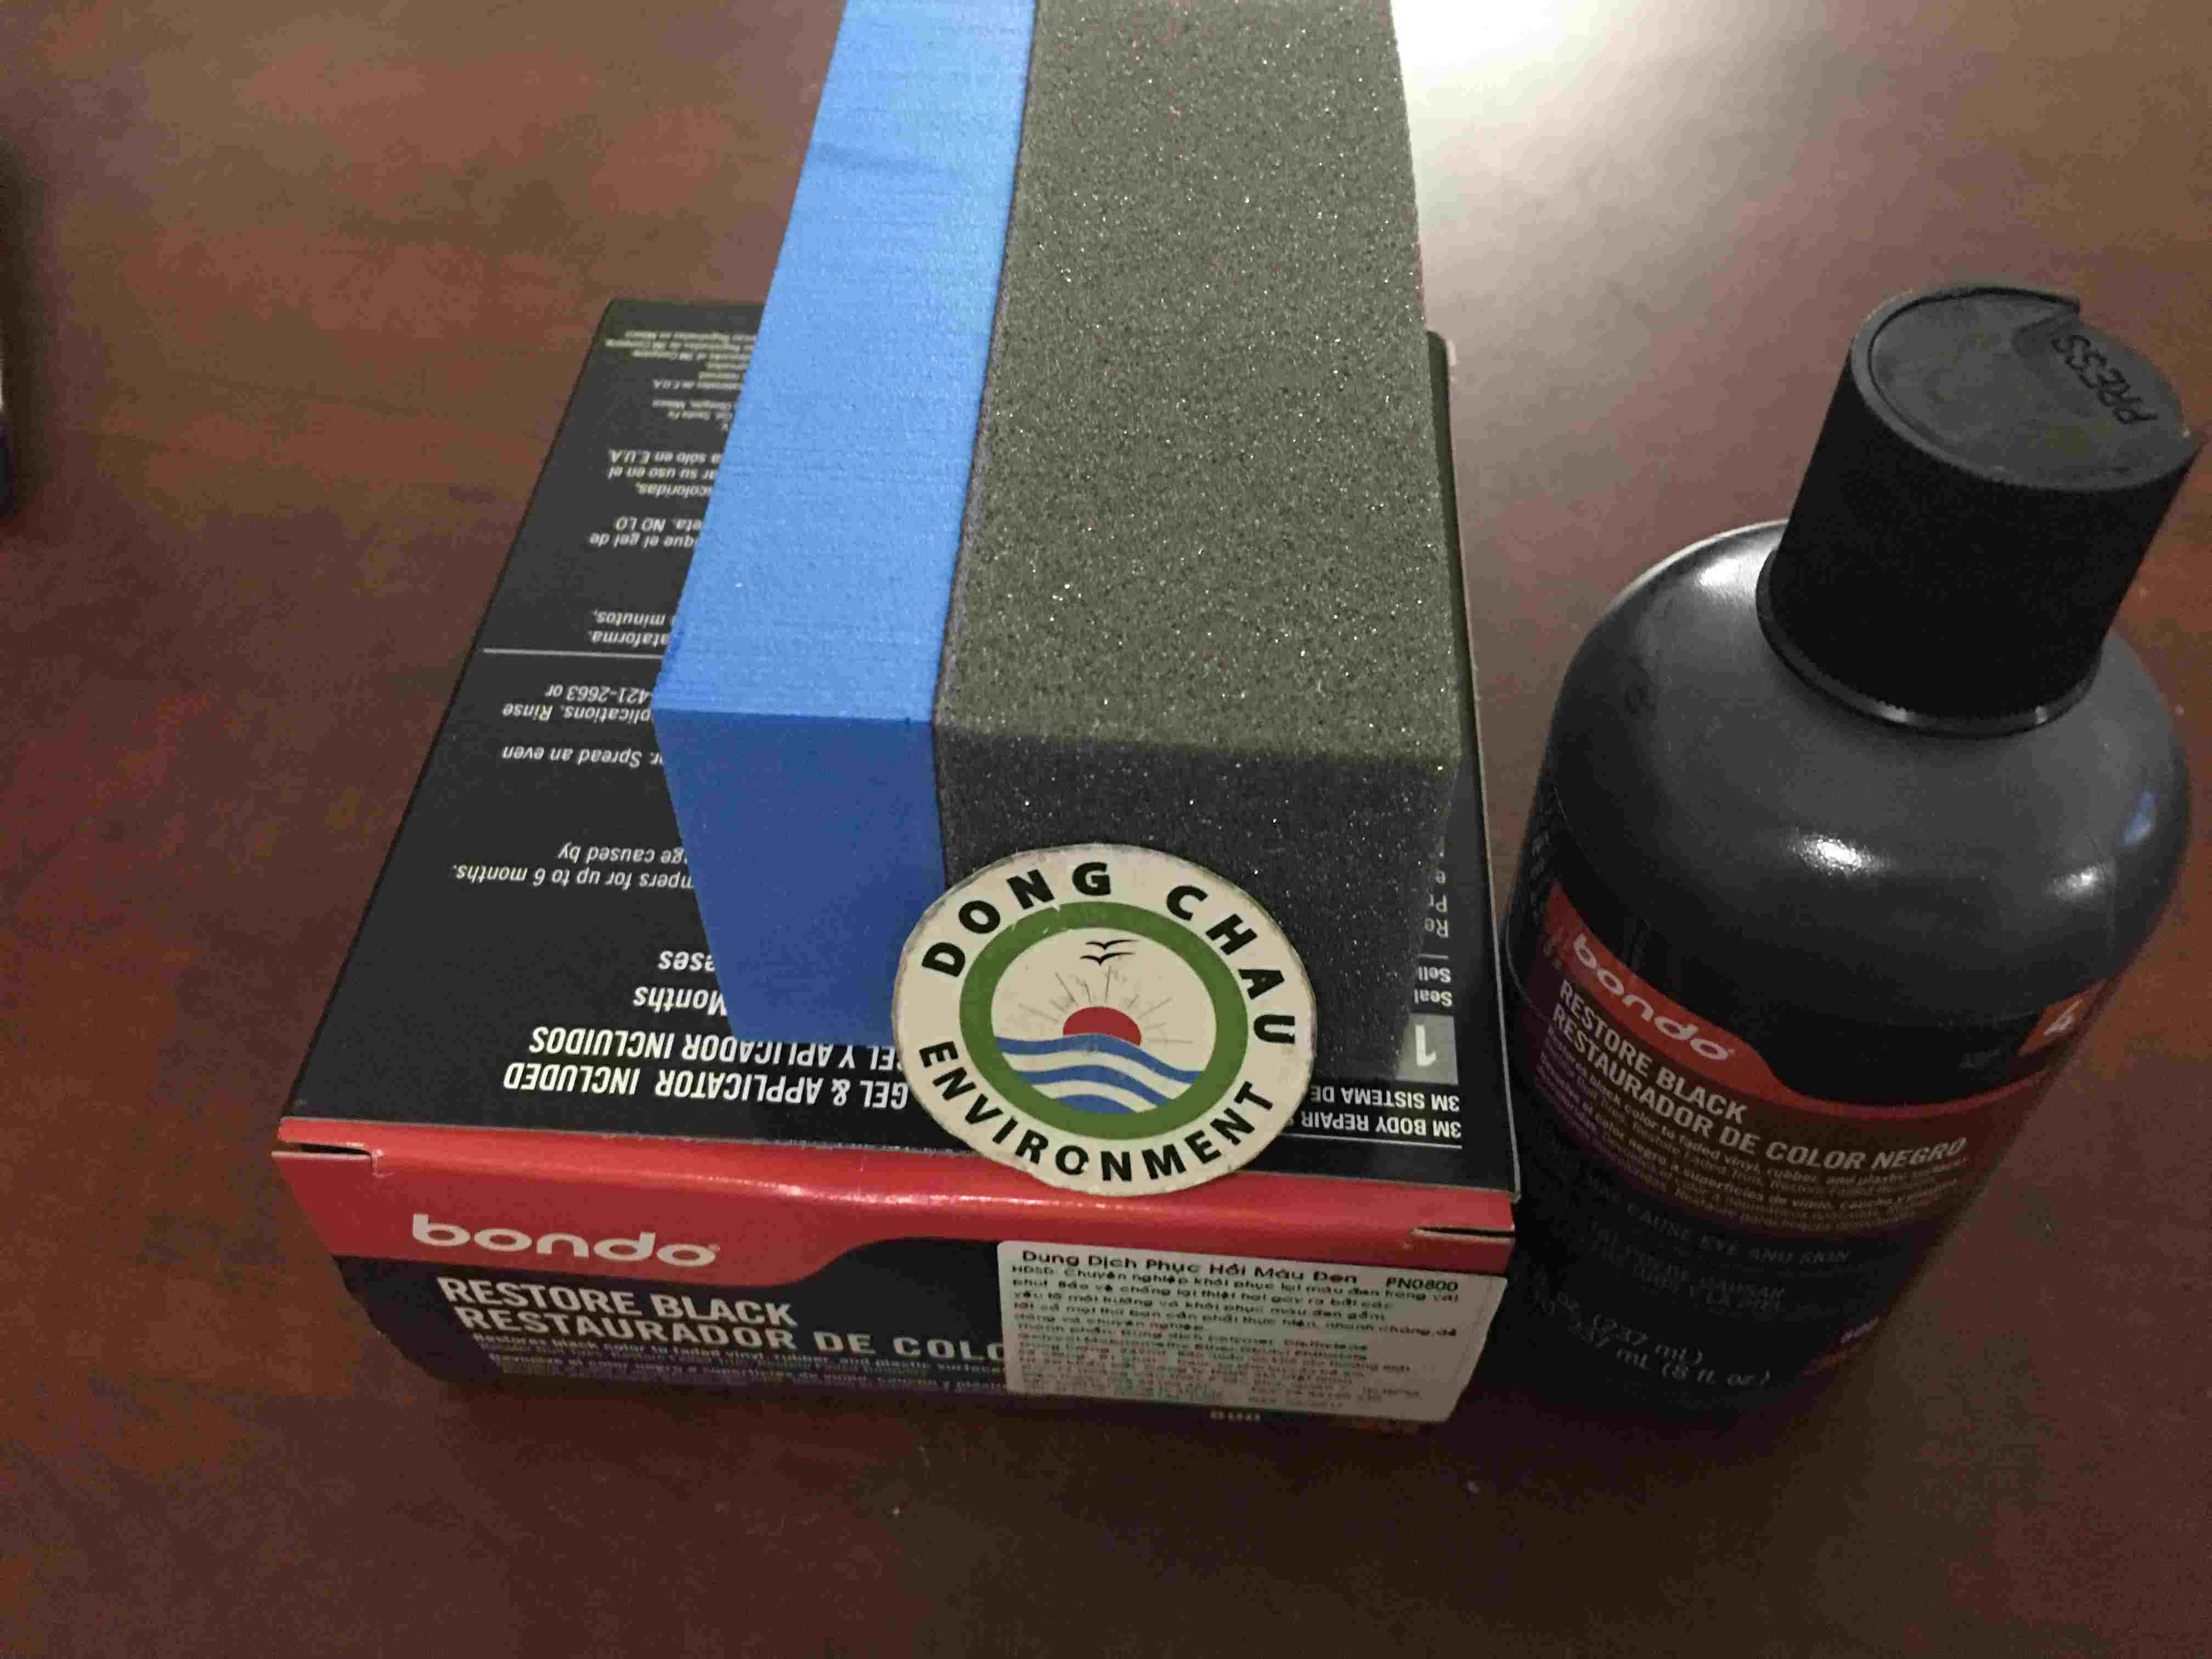 Chai phục hồi nhựa đen – 3M BONDO RESTORE BLACK PN0800